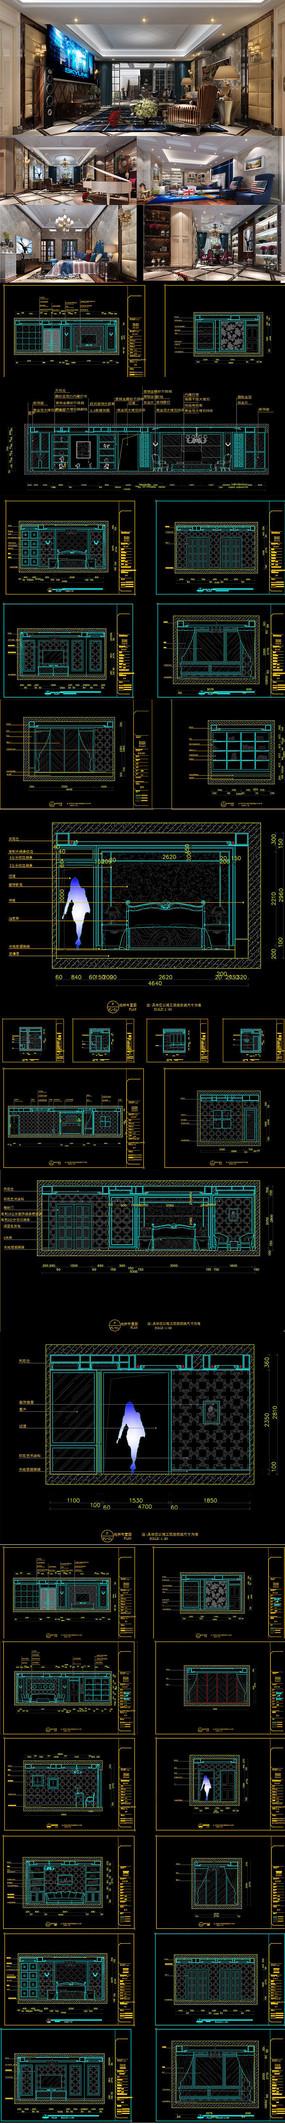 全套美式家装CAD施工图 效果图